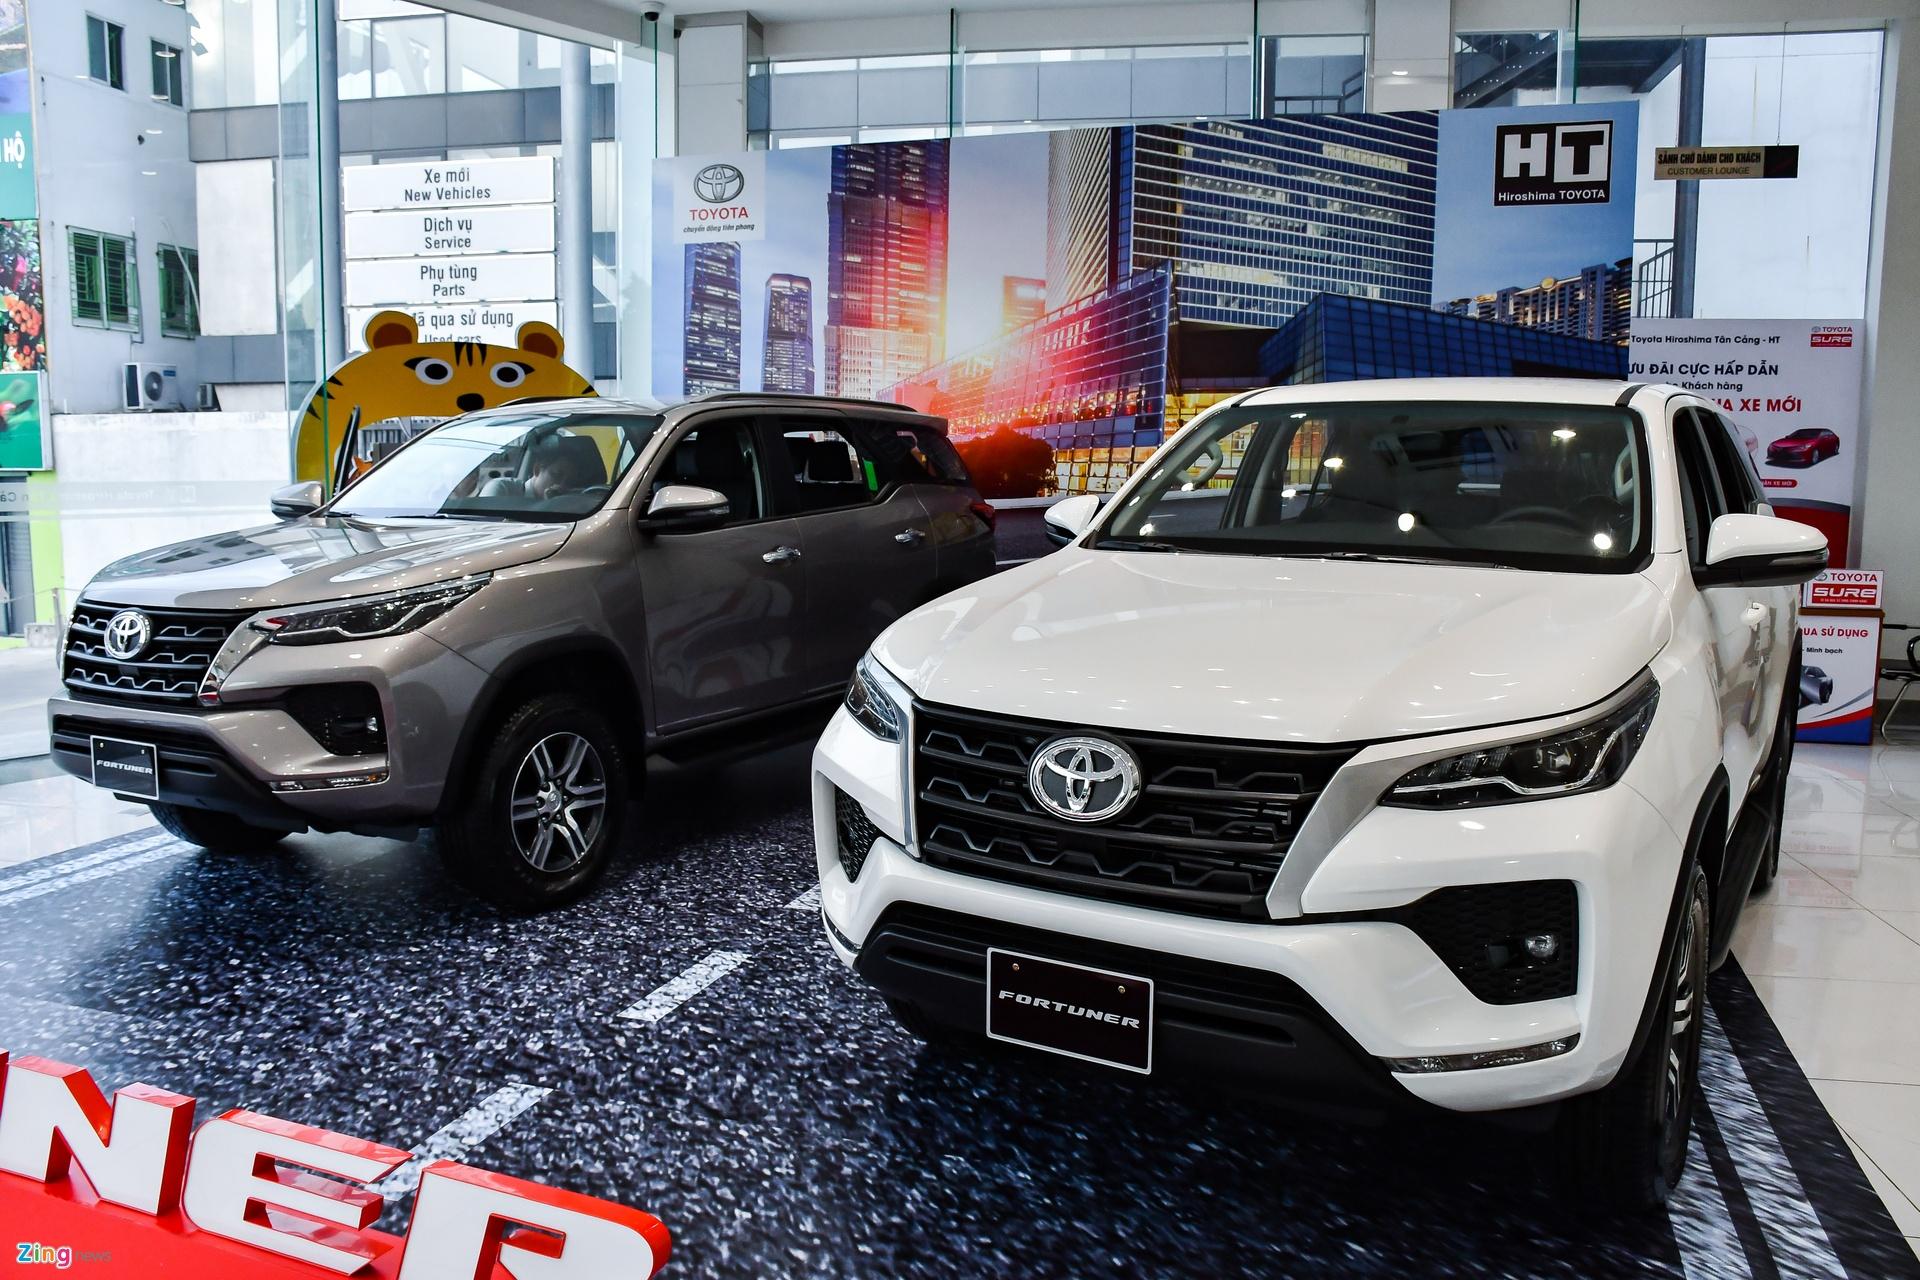 Toyota bam duoi Hyundai ve thi phan anh 3